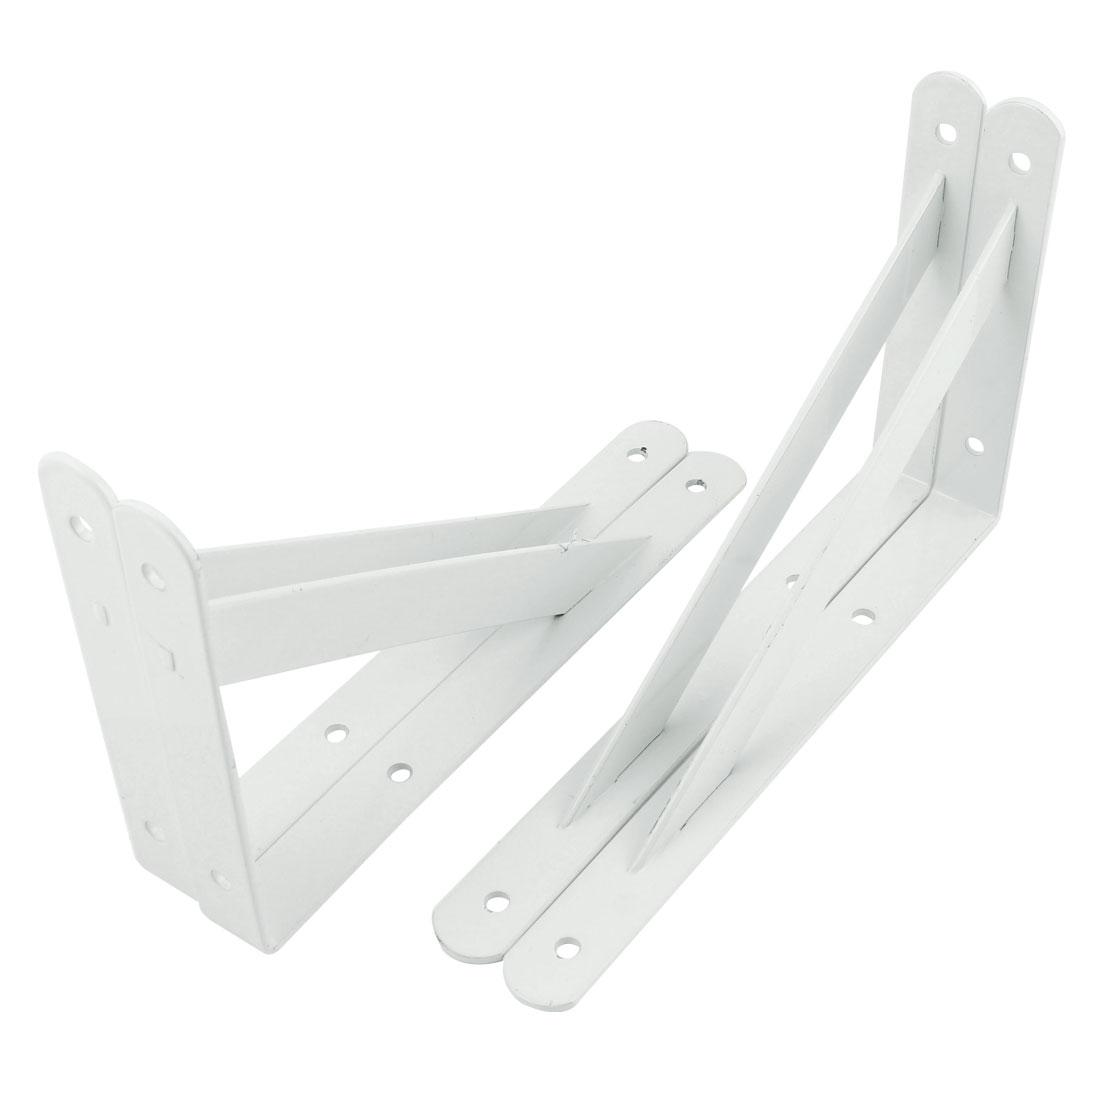 "10"" x 6"" White L Shaped Book Goods Holder Shelf Bracket Support 4 Pcs"